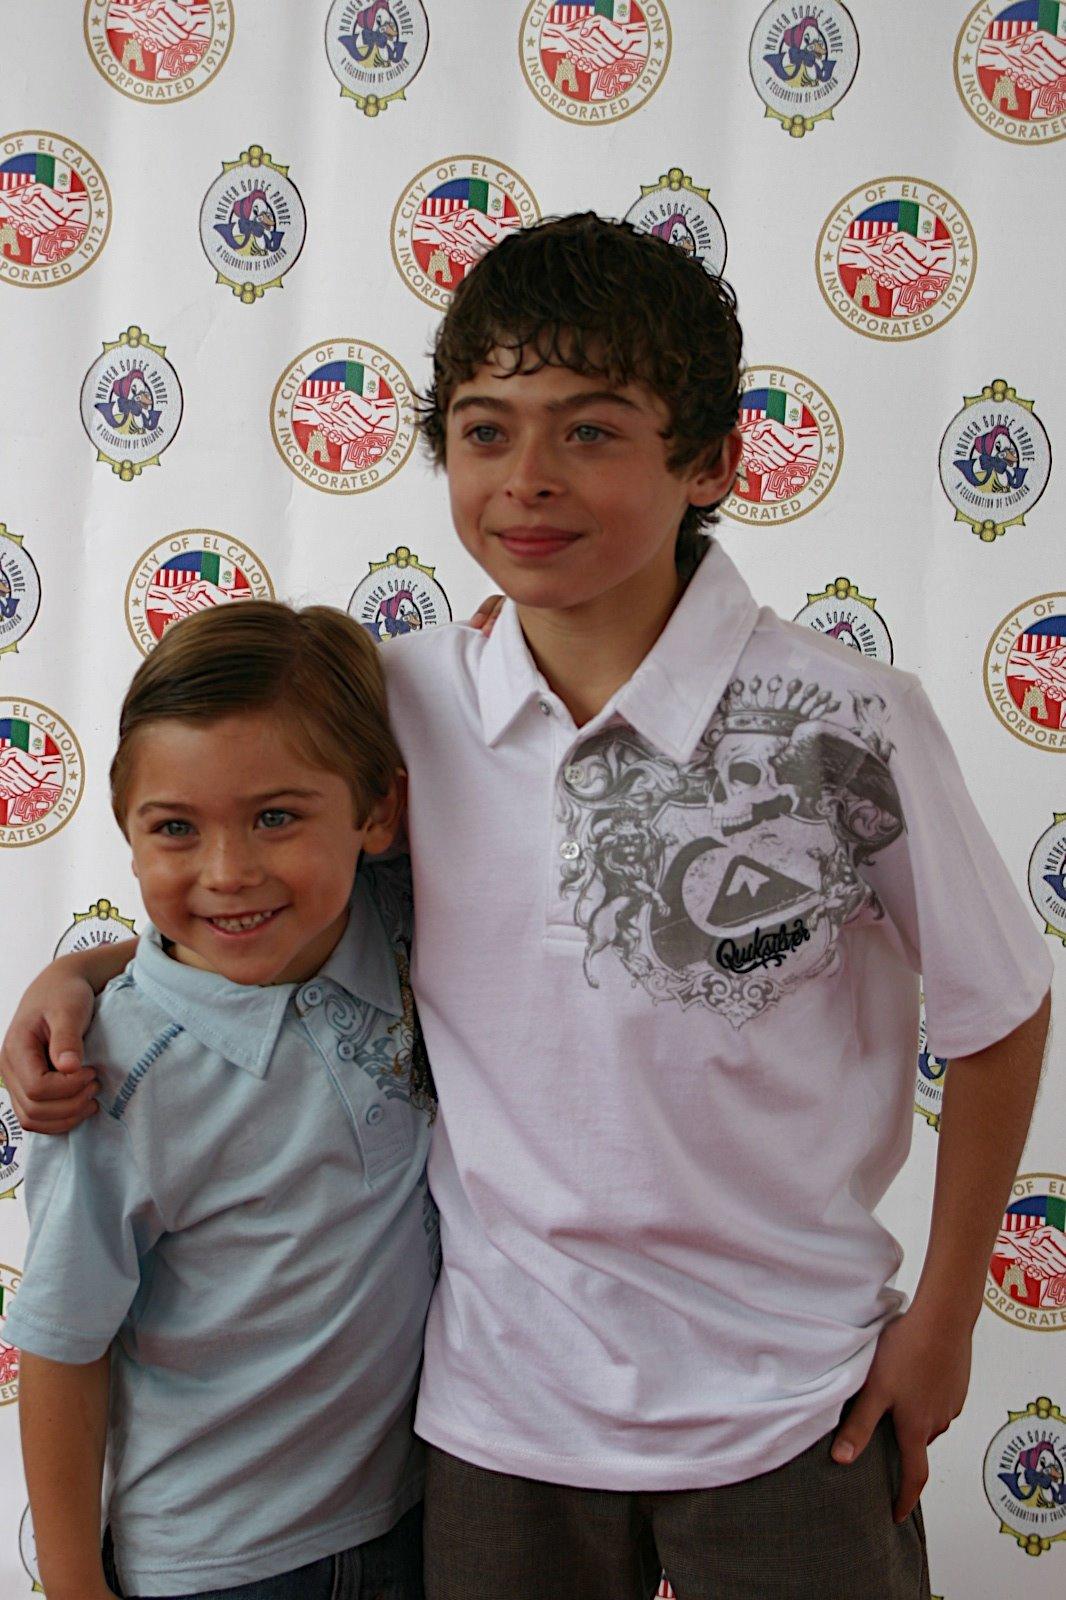 The 22-year old son of father (?) and mother Deanna Ochoa Ryan Ochoa in 2018 photo. Ryan Ochoa earned a  million dollar salary - leaving the net worth at  million in 2018